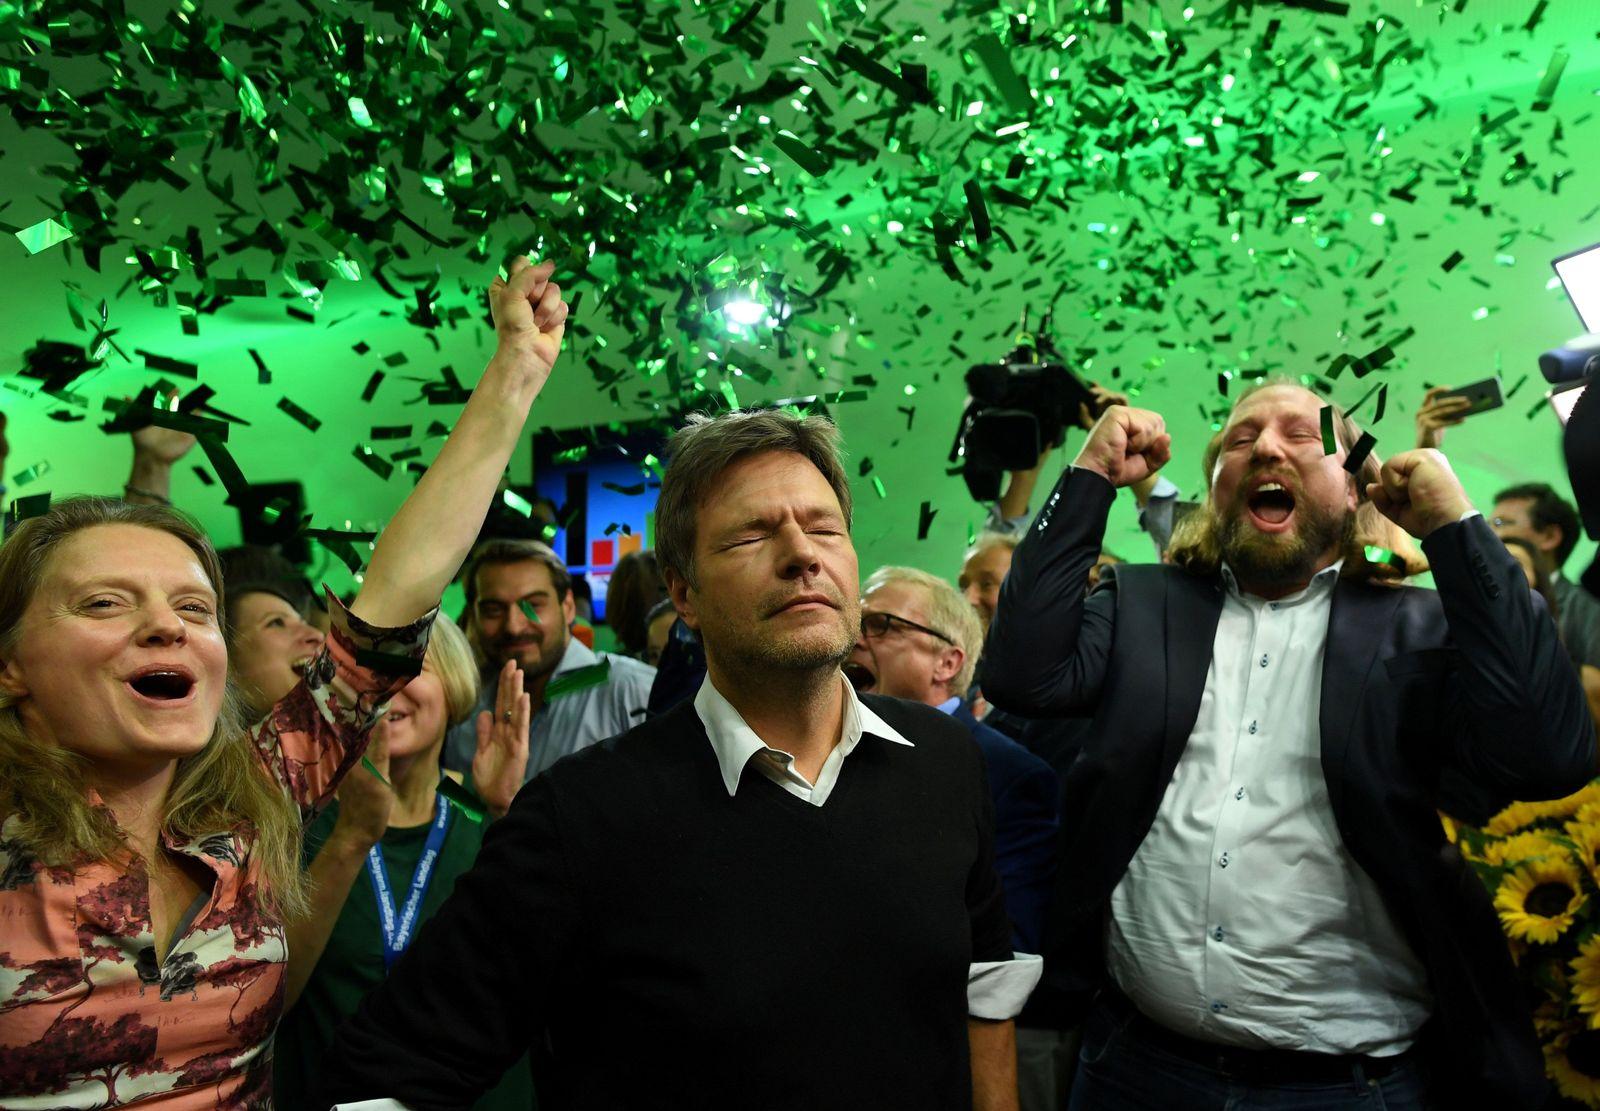 GERMANY-POLITICS/BAVARIA REACTIONS